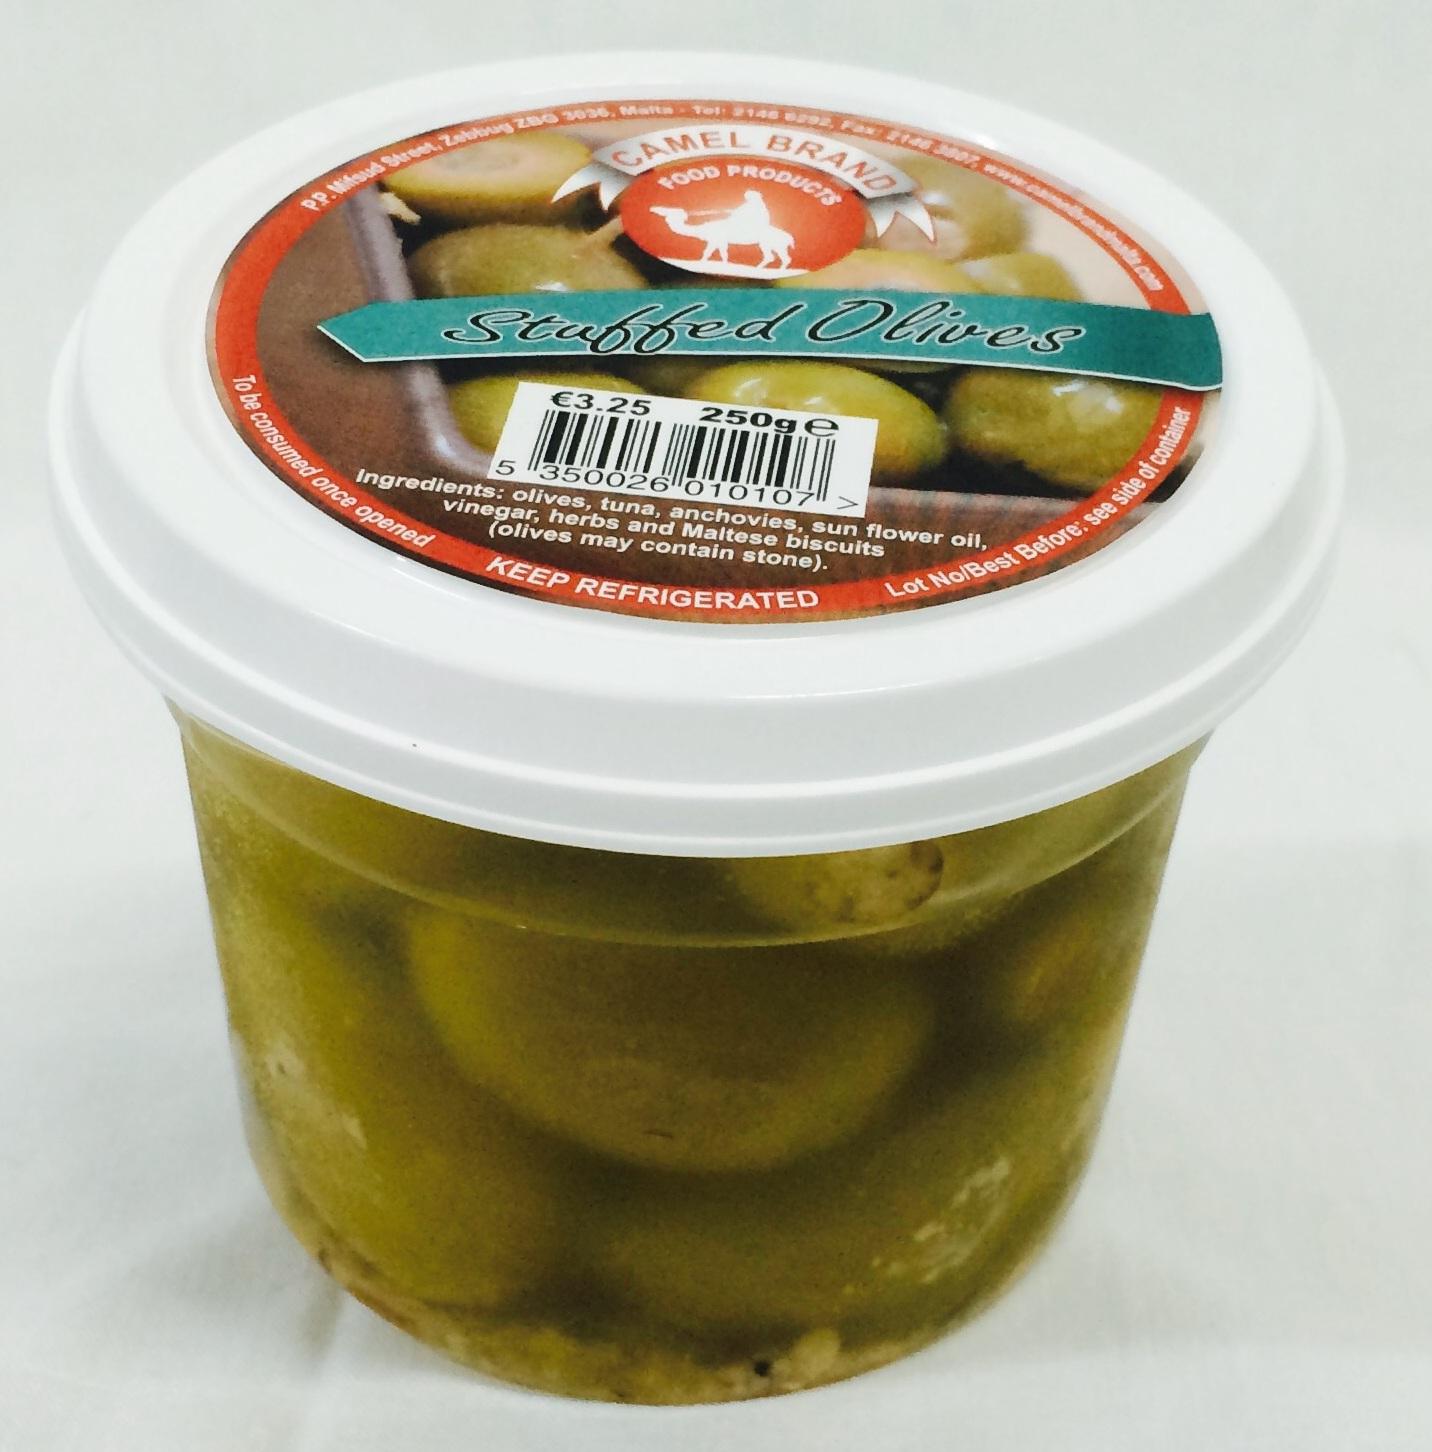 Camel Brand Stuffed Olives